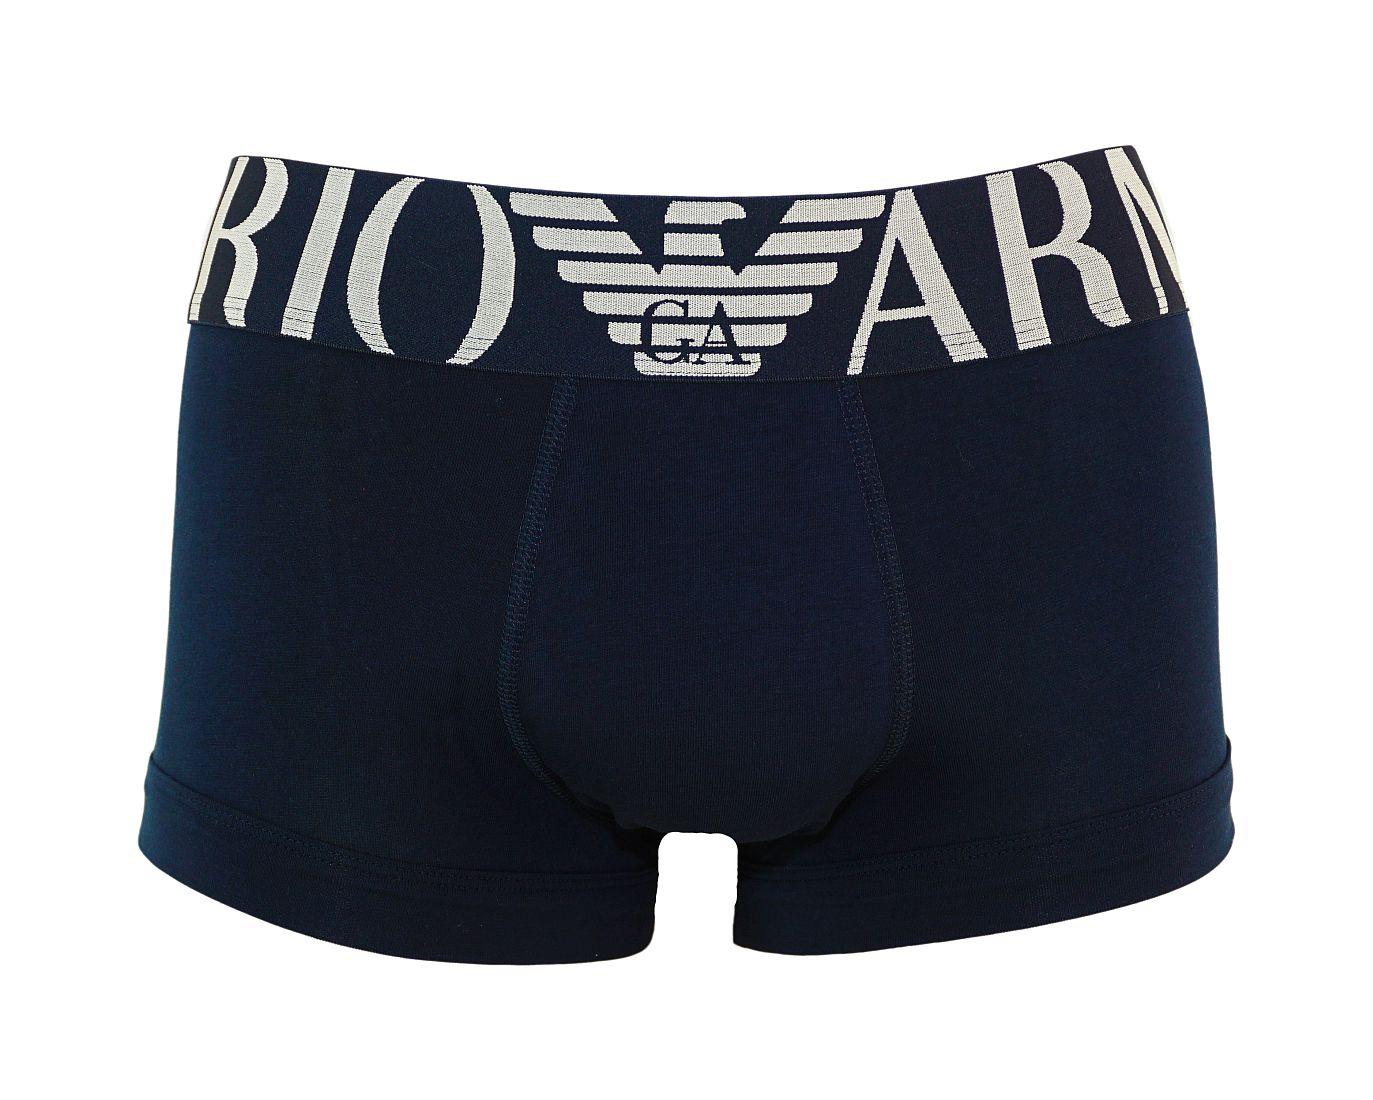 Emporio Armani Trunk Shorts Unterhose MARINE 111389 7P516 00135 WF17-EAT1